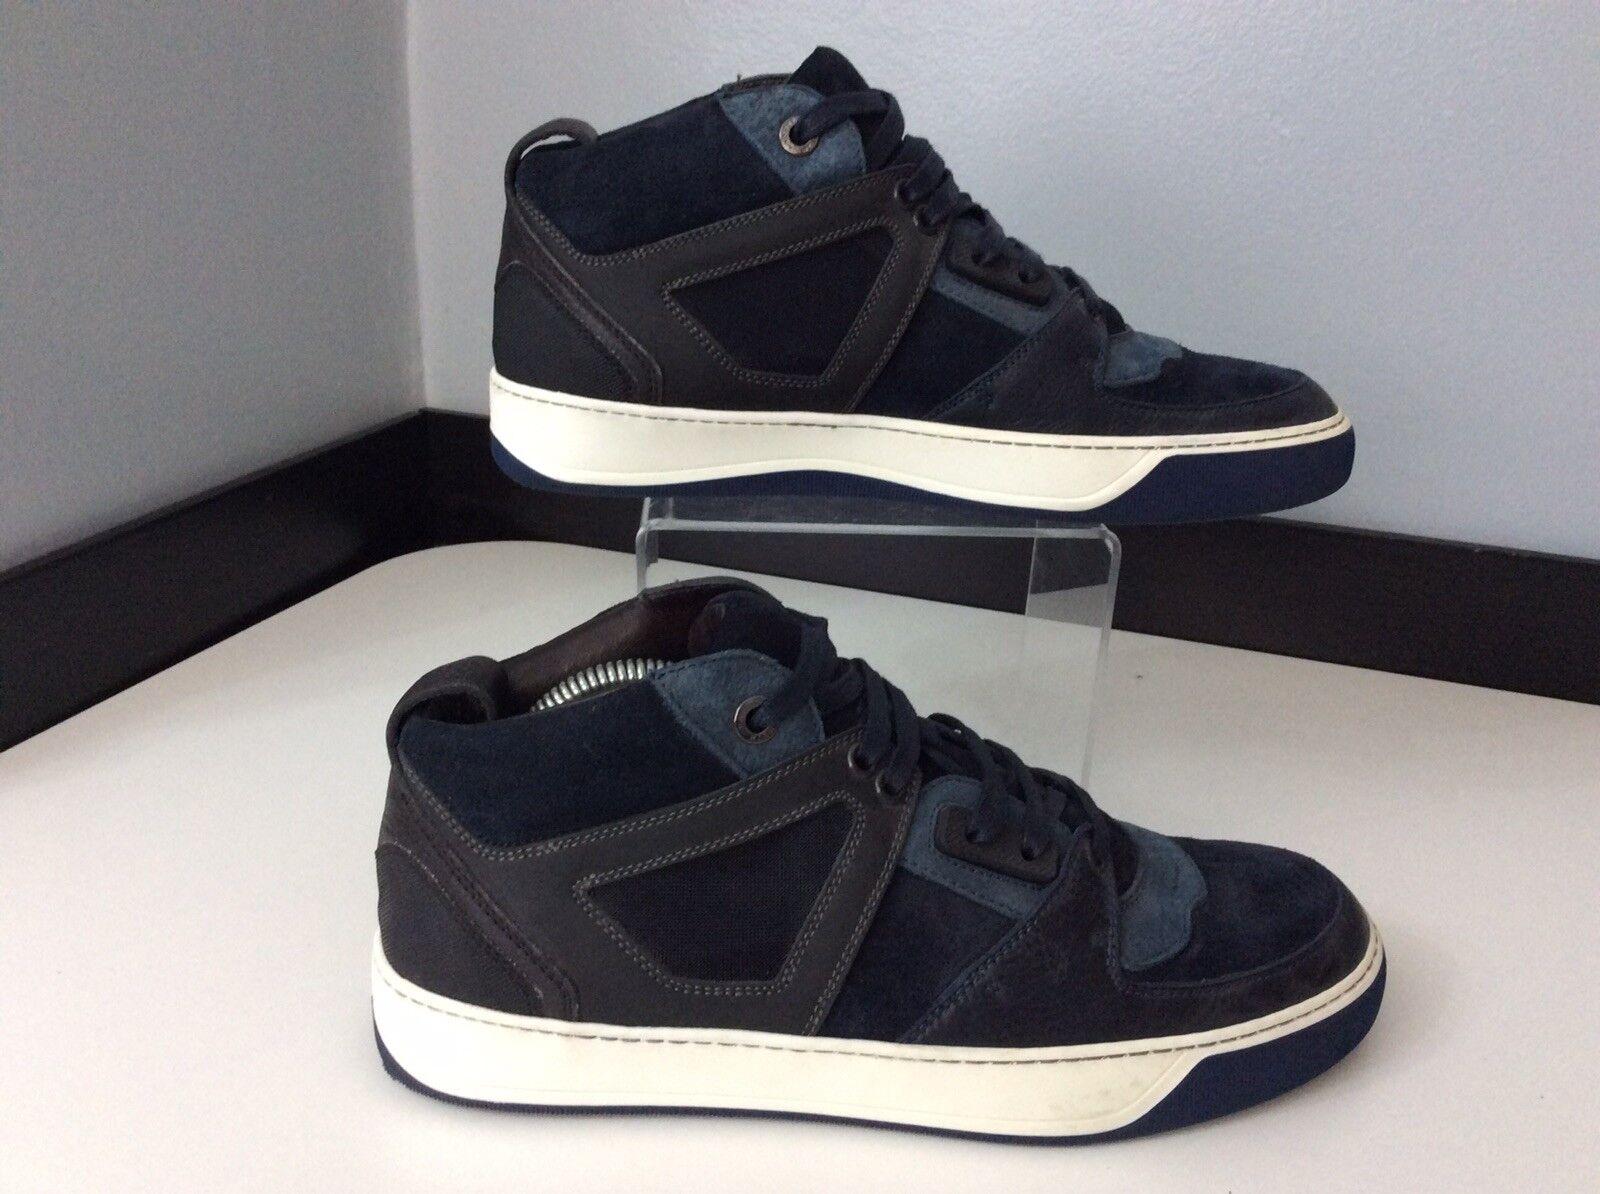 Lanvin Mens Hi Top Sneakers, Eu40, Runners, bluee, Leather